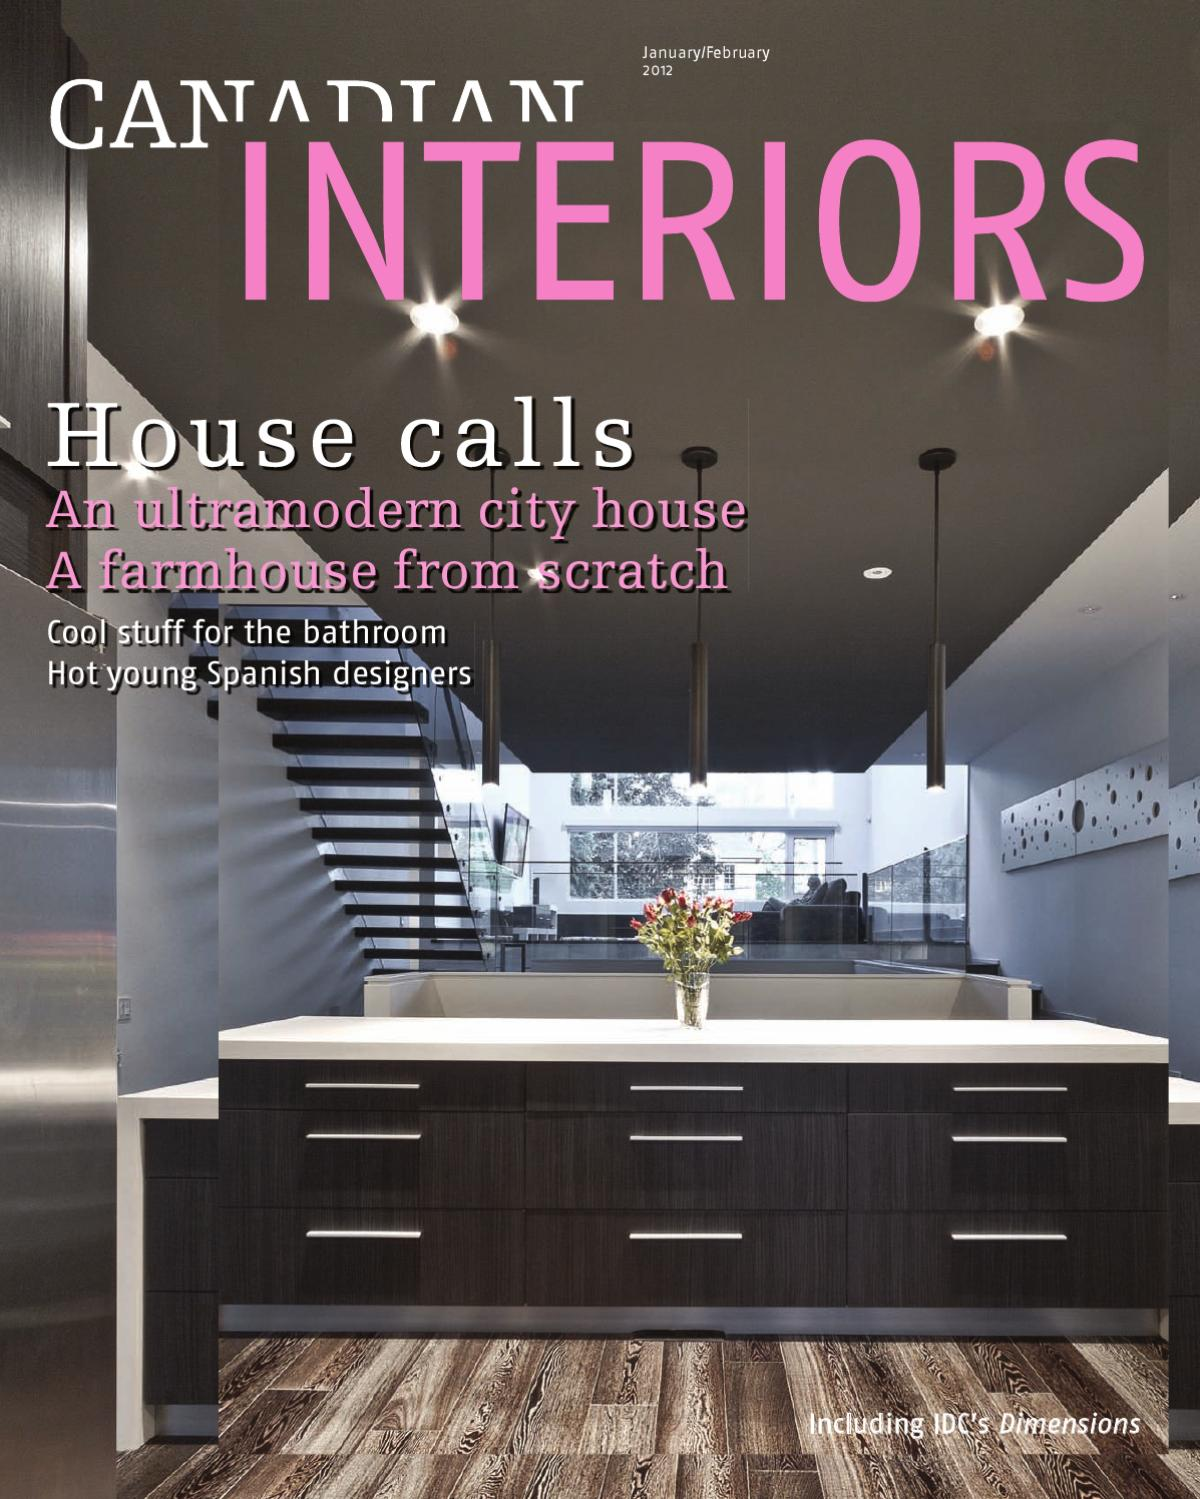 Canadian interiors januaryfebuary 2012